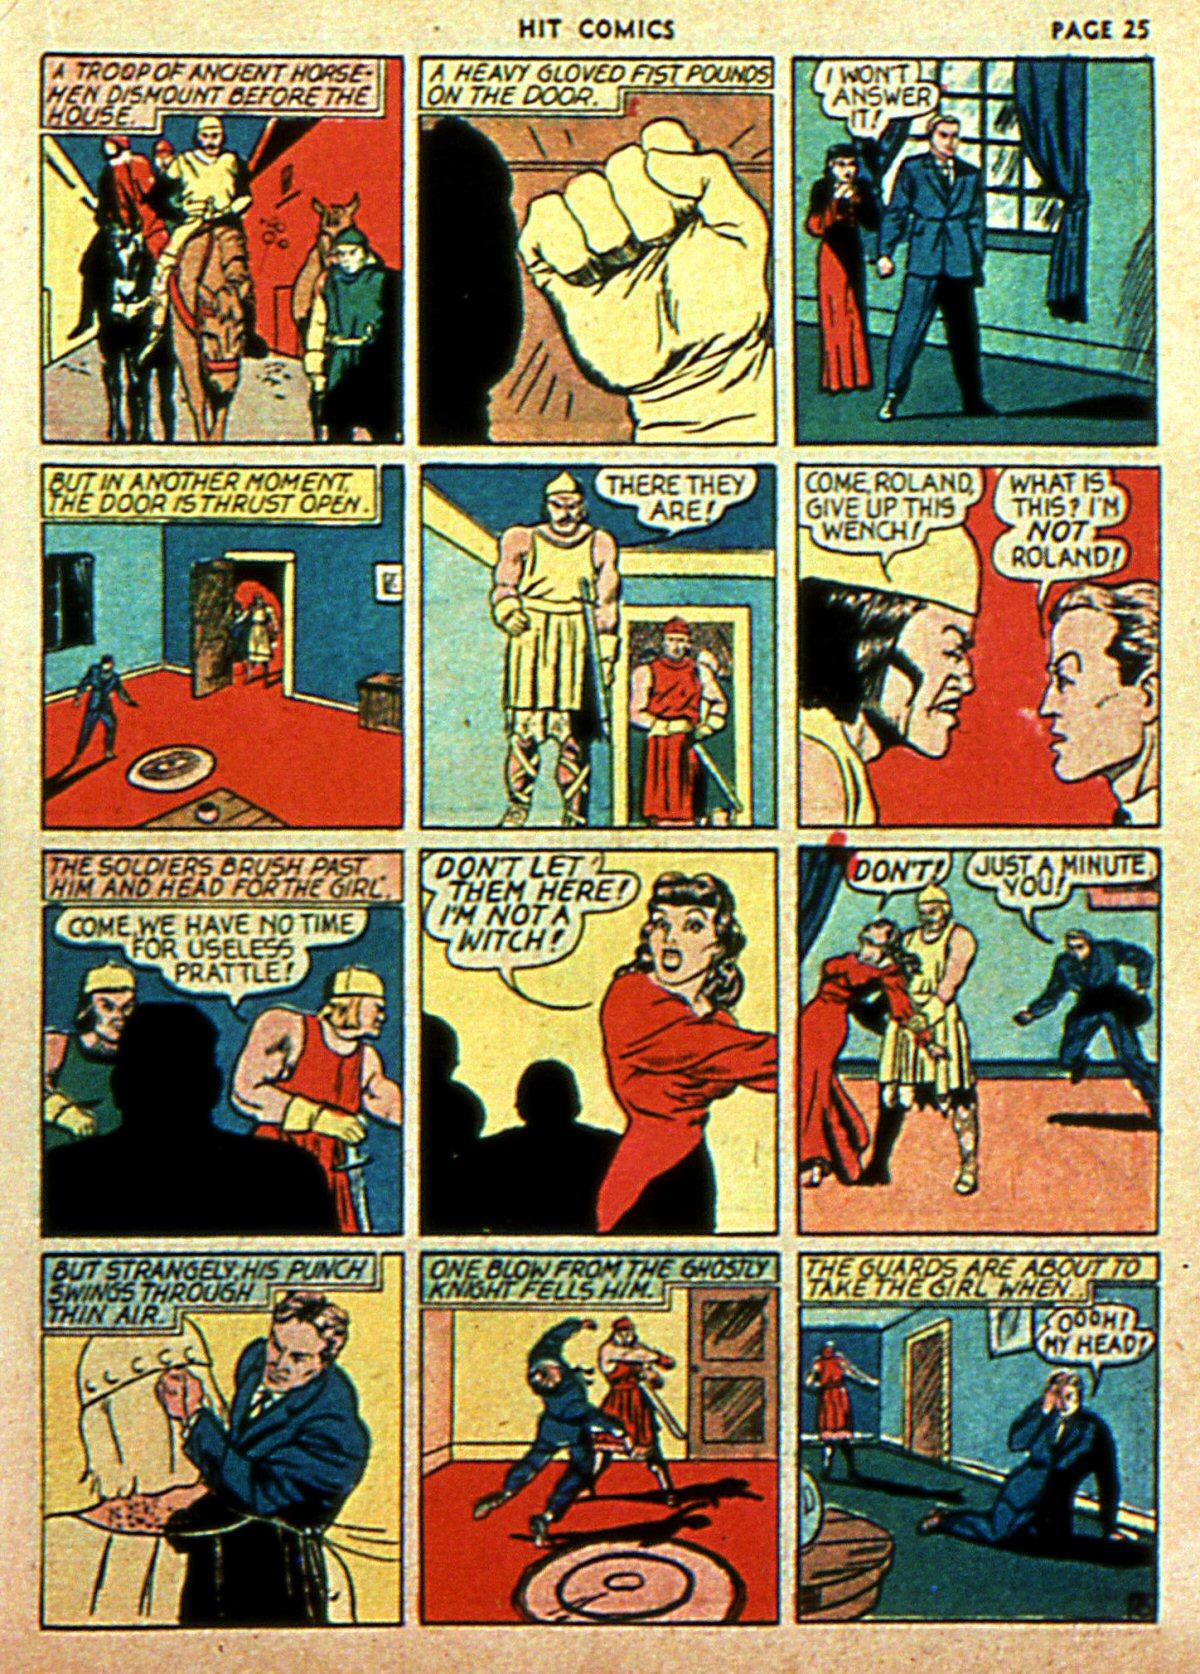 Read online Hit Comics comic -  Issue #2 - 27